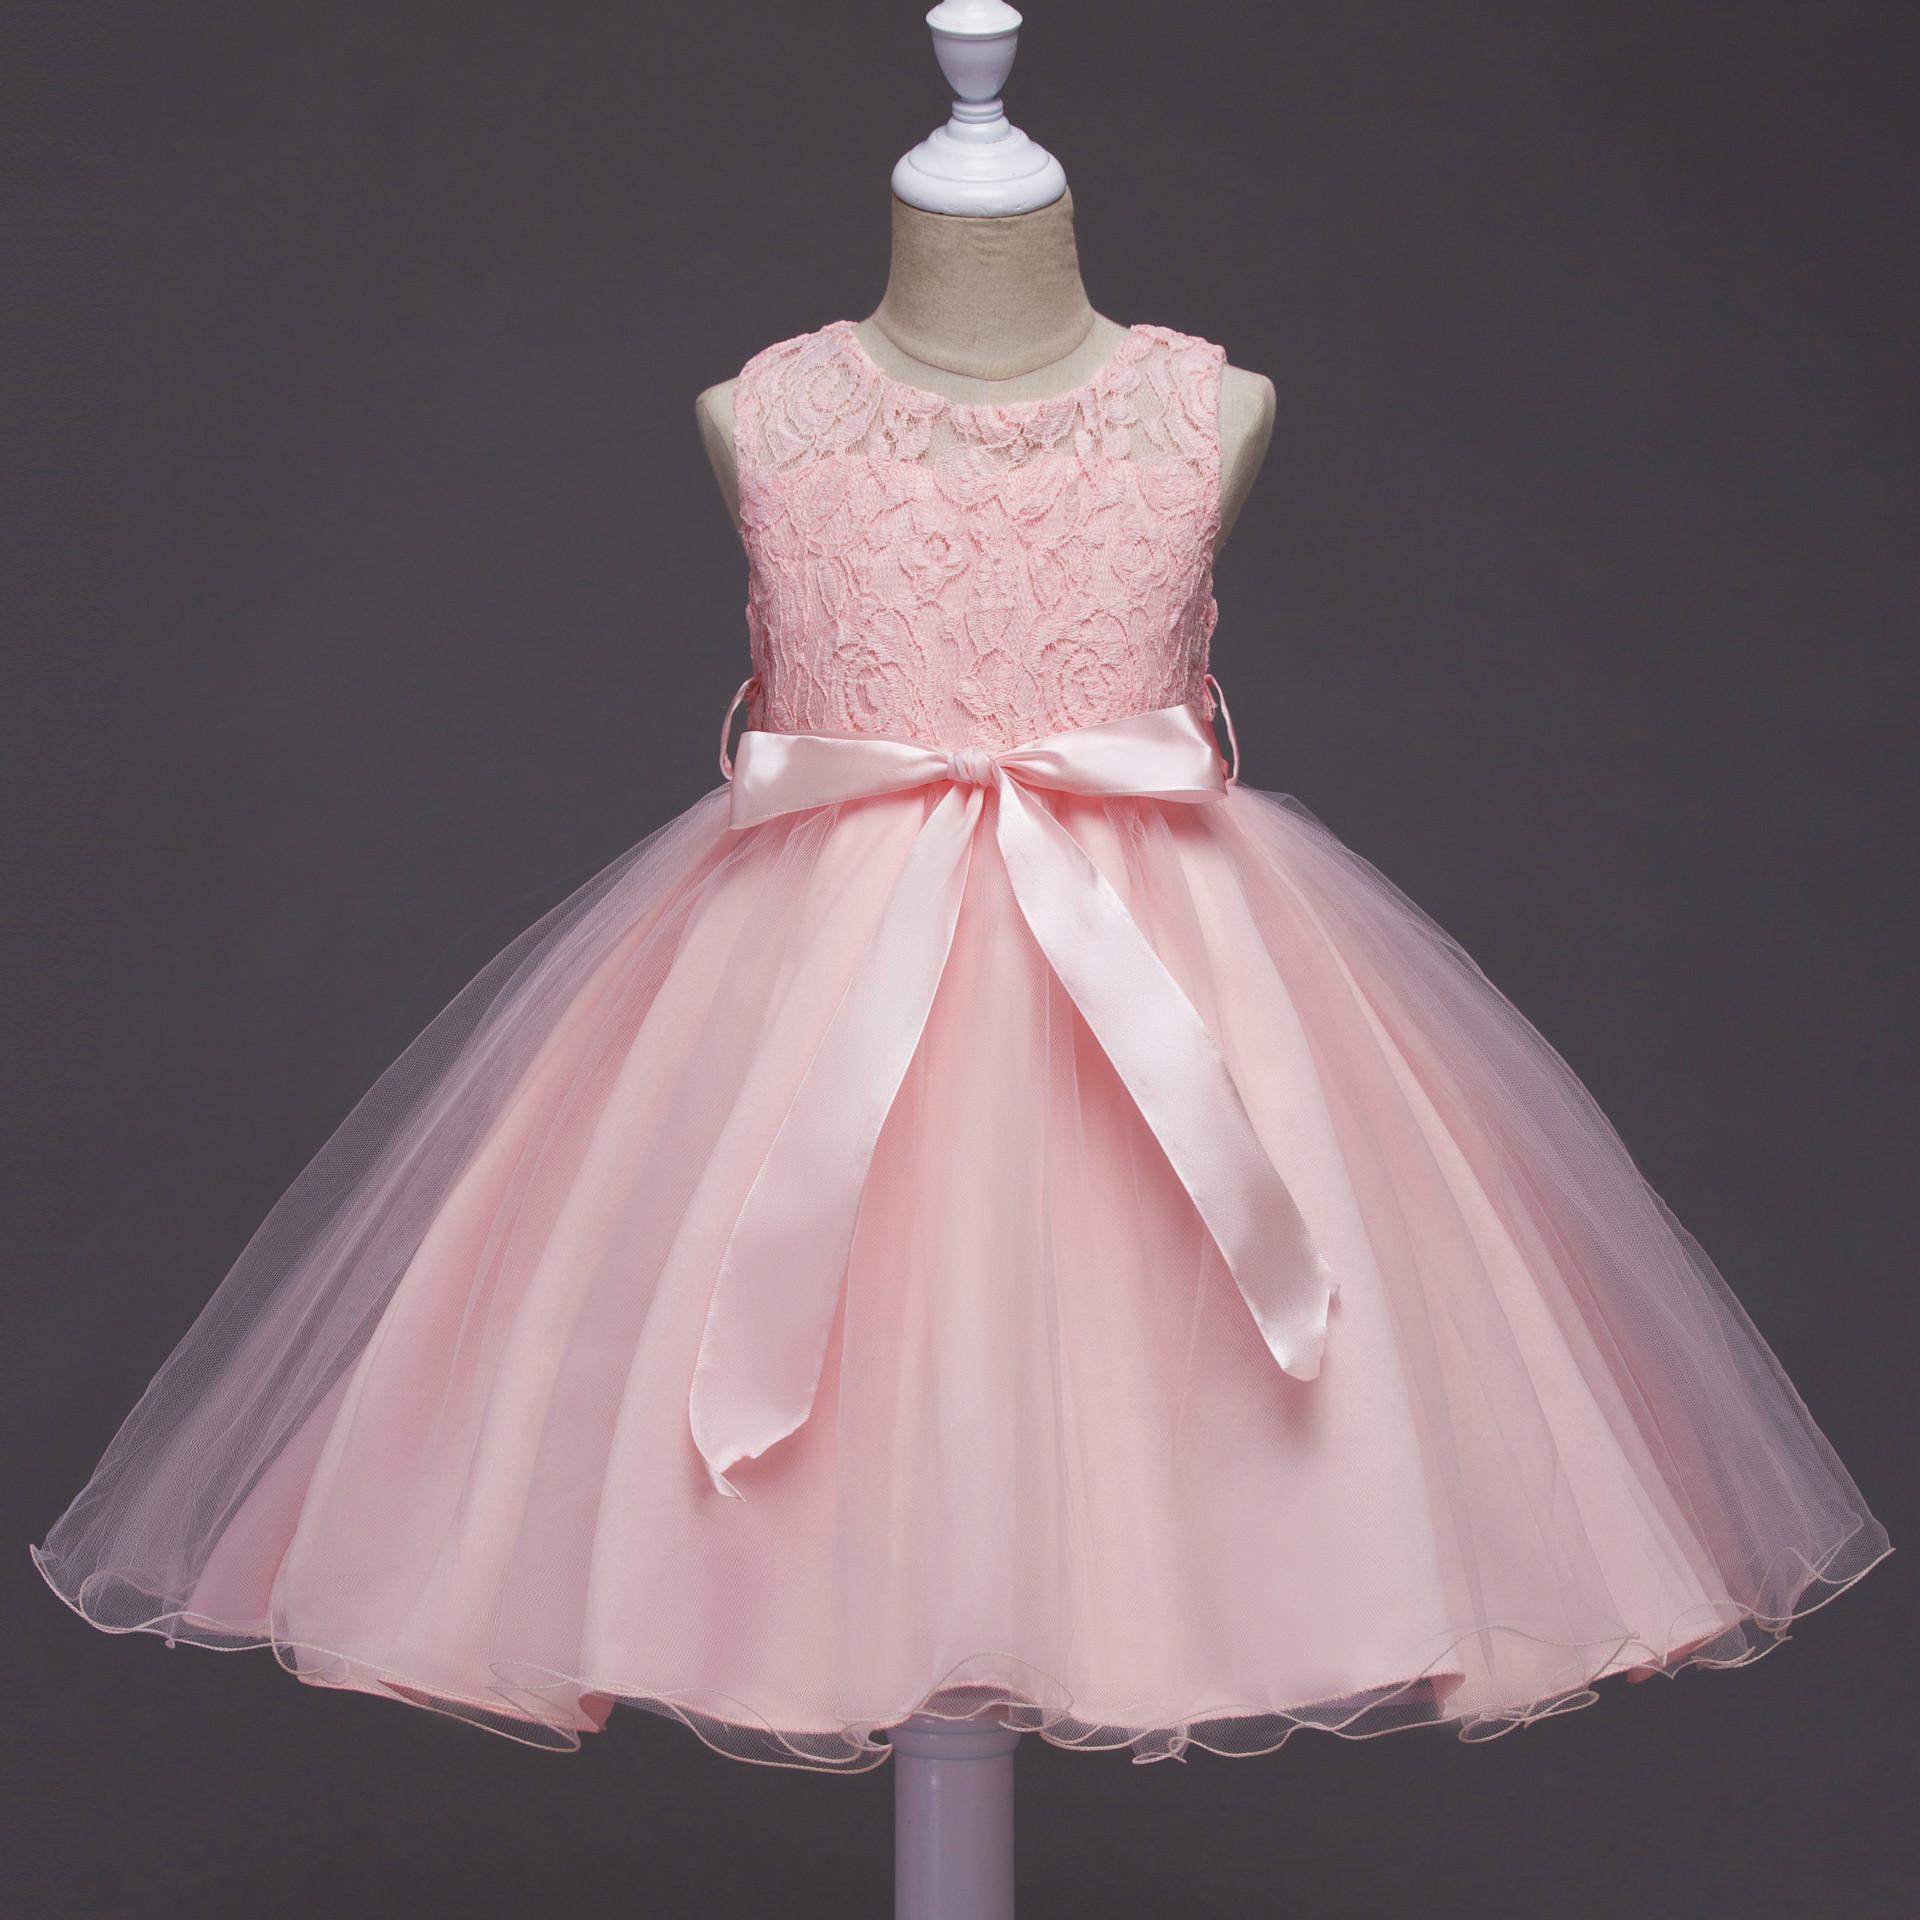 Mode Patchwork Mesh Mädchen Kleider Tank Prinzessin Ball gewachsen O-Ausschnitt ärmellose Blumenmädchen Kleid